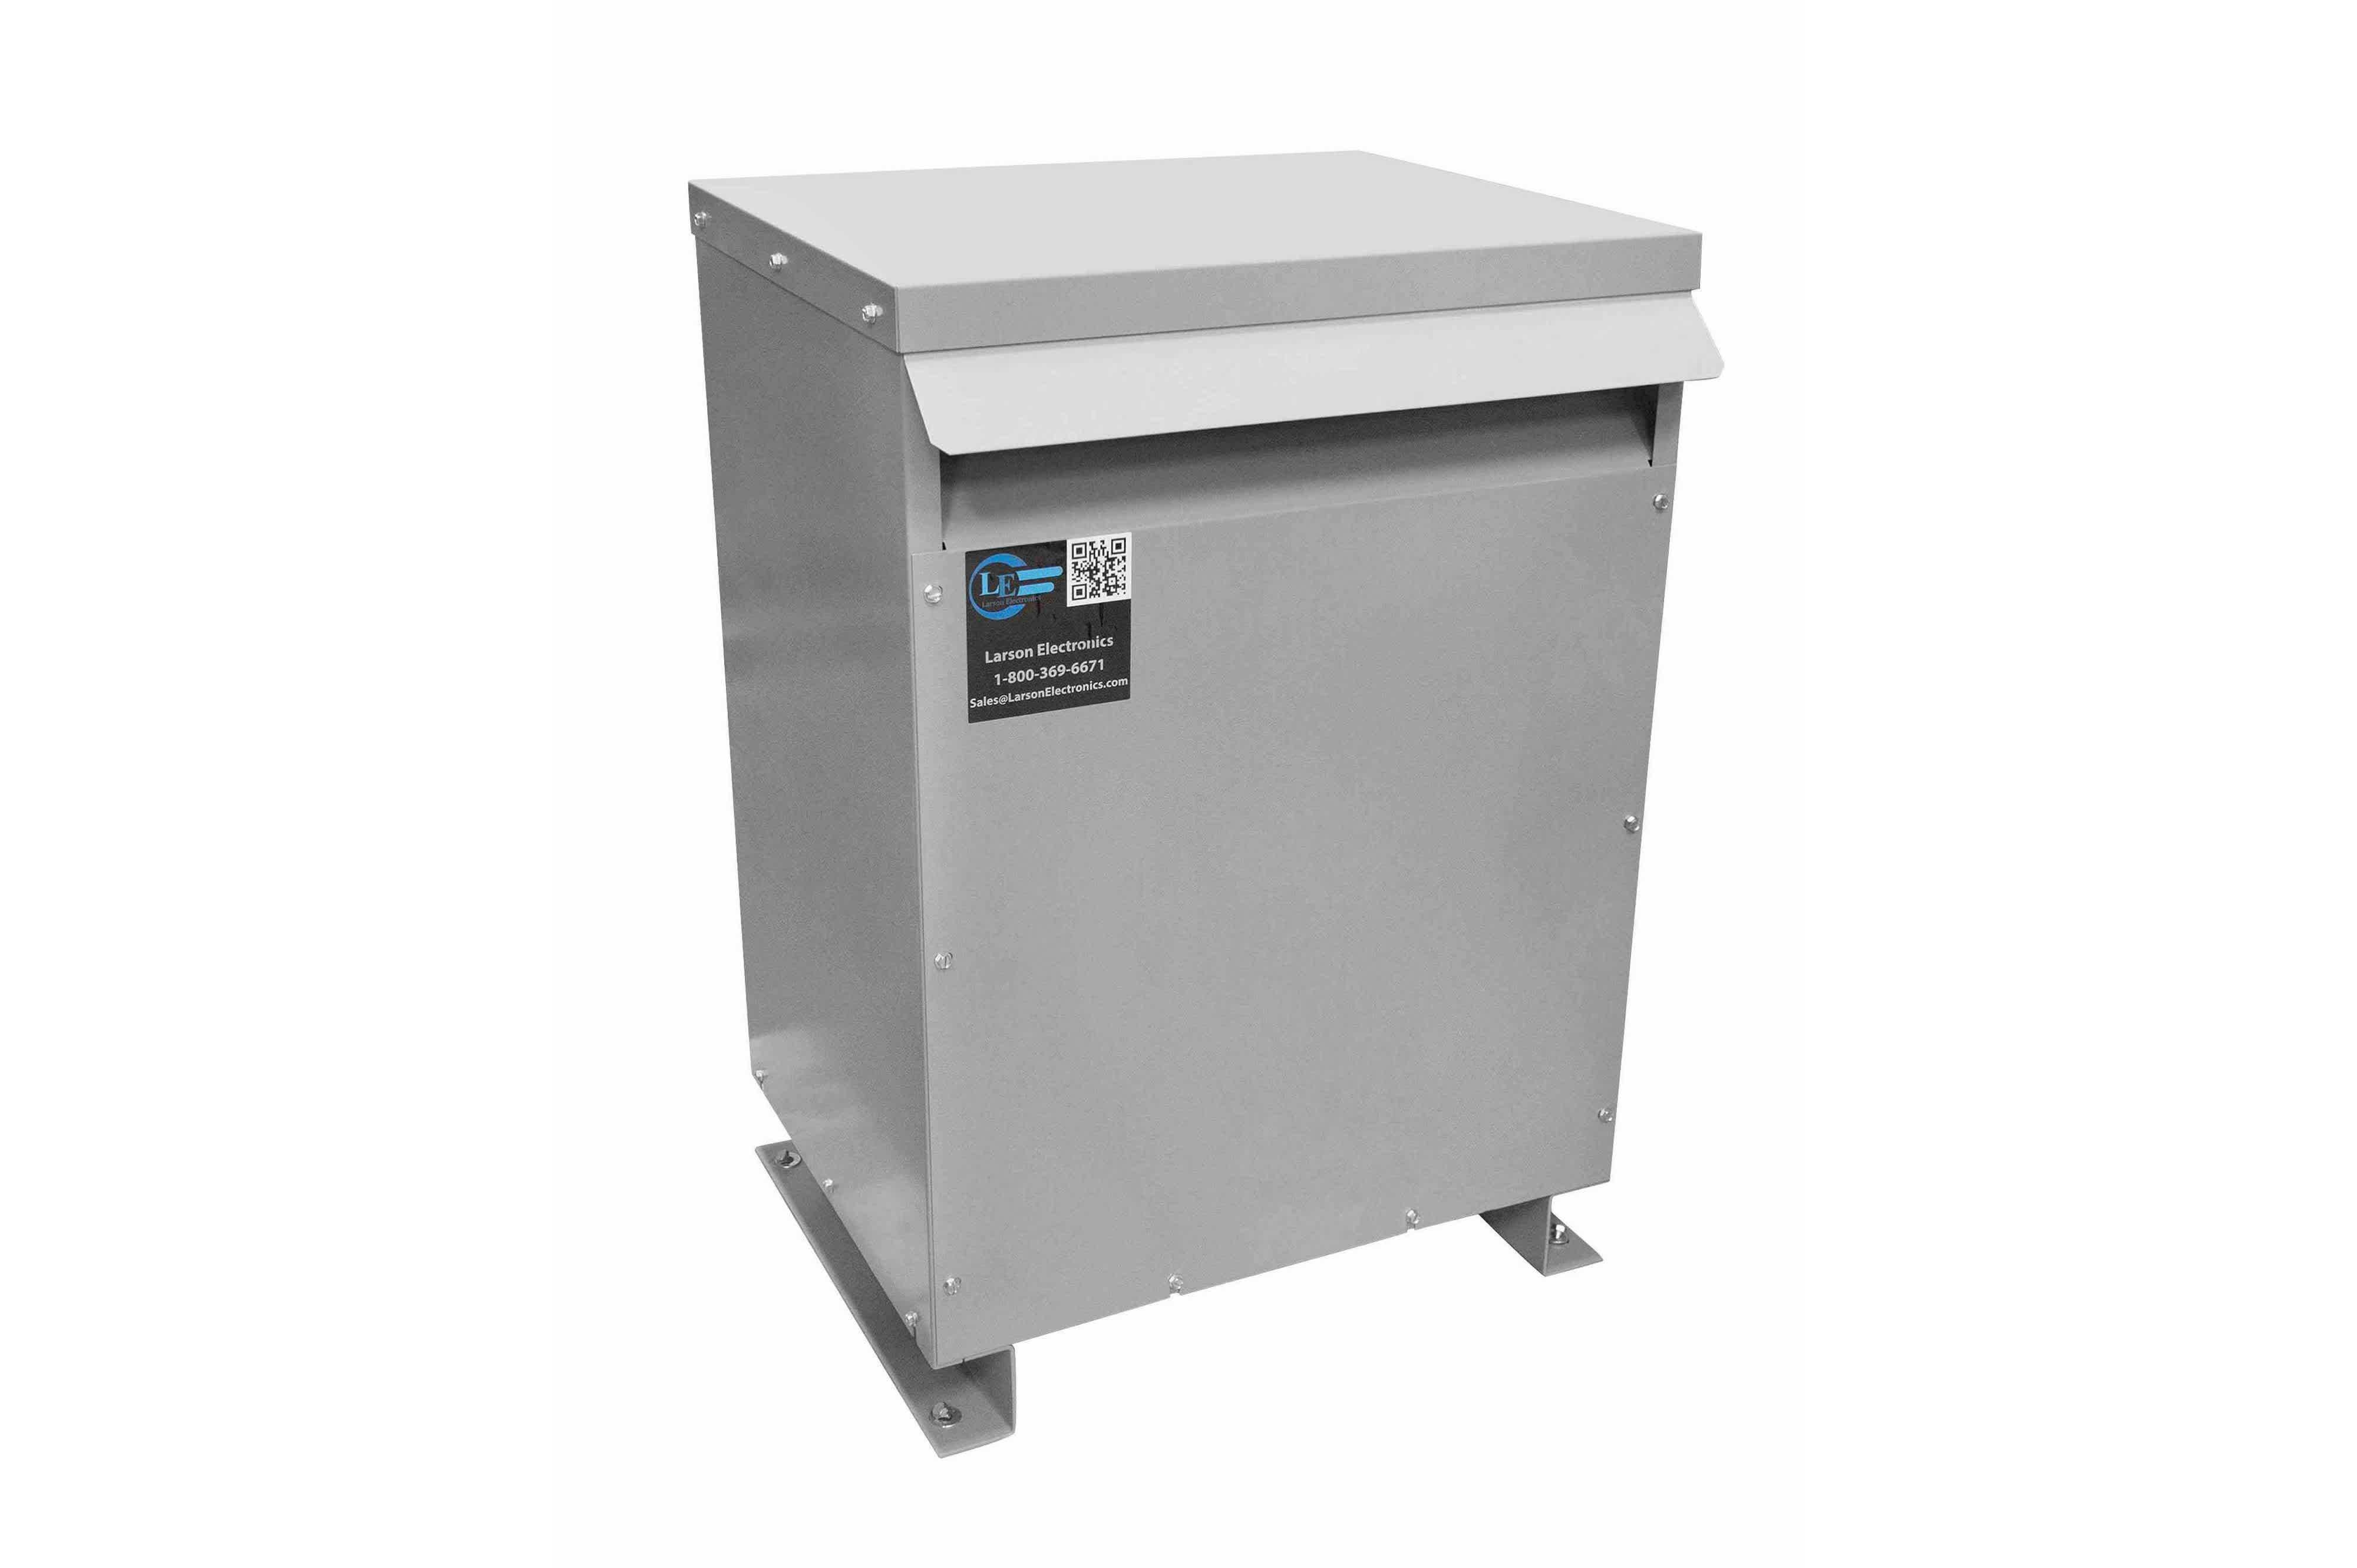 100 kVA 3PH Isolation Transformer, 400V Wye Primary, 480V Delta Secondary, N3R, Ventilated, 60 Hz